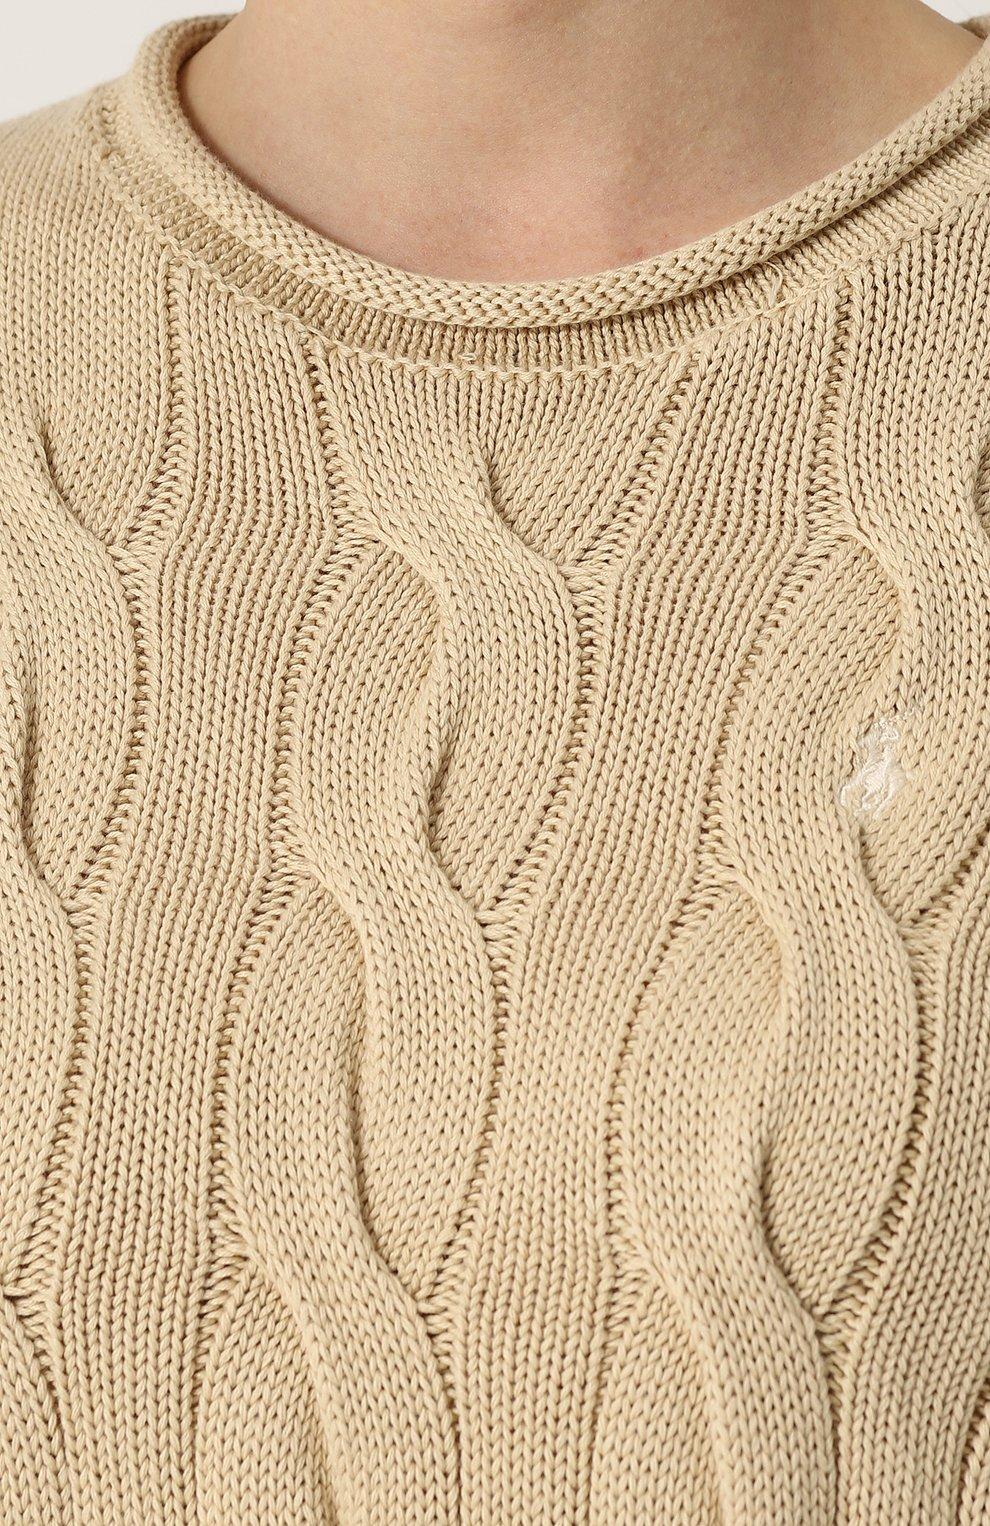 Пуловер фактурной вязки с логотипом бренда | Фото №5